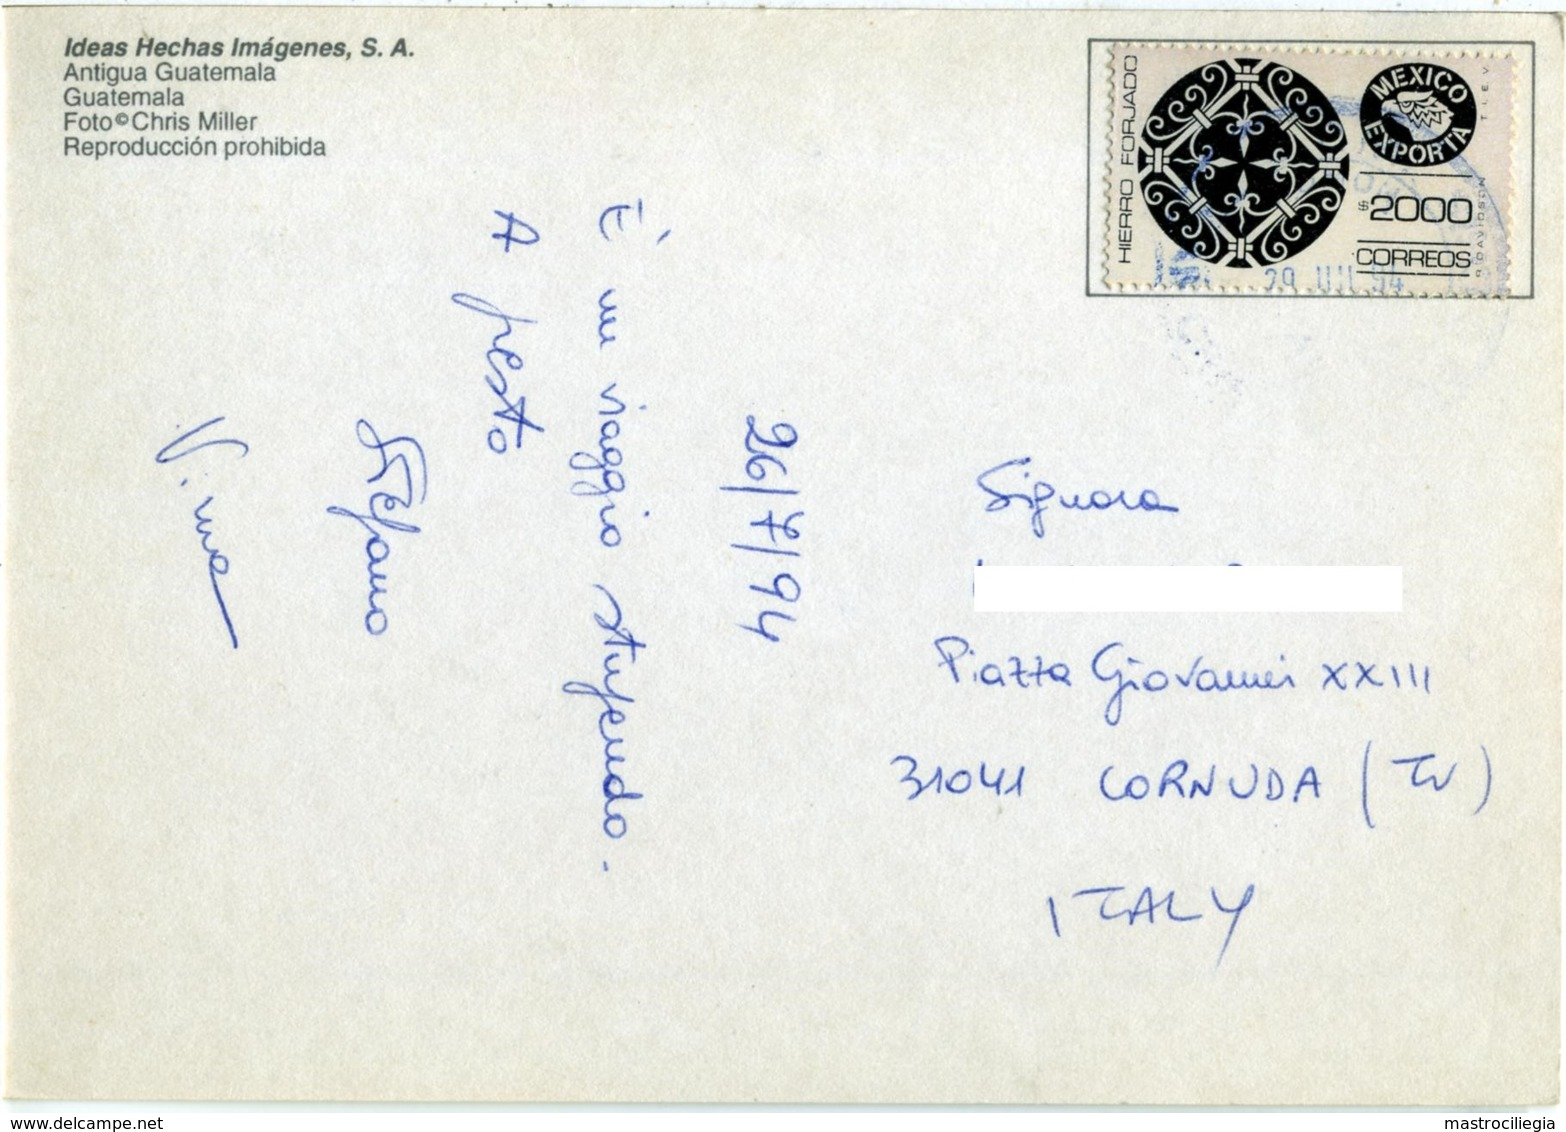 GUATEMALA  Antigua Guatemala  Mexico Nice Stamp - Guatemala